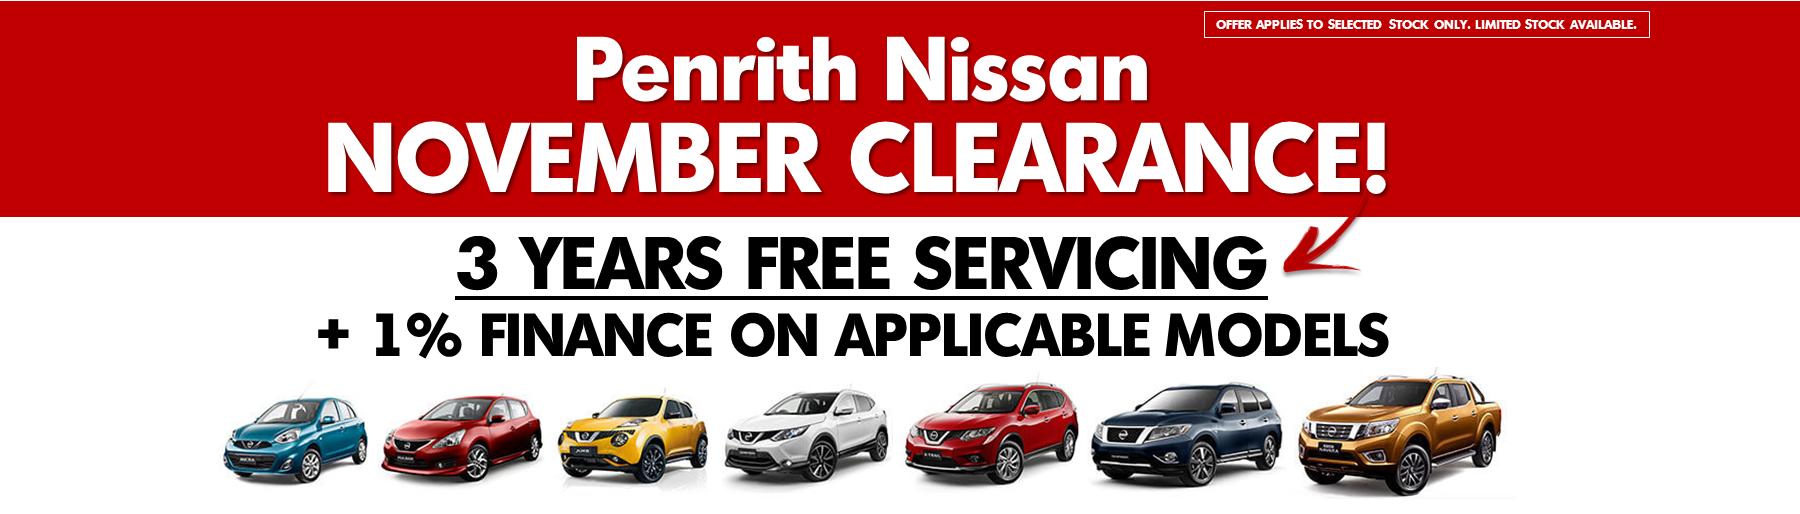 Special Offers Nissan Cars Car Dealer